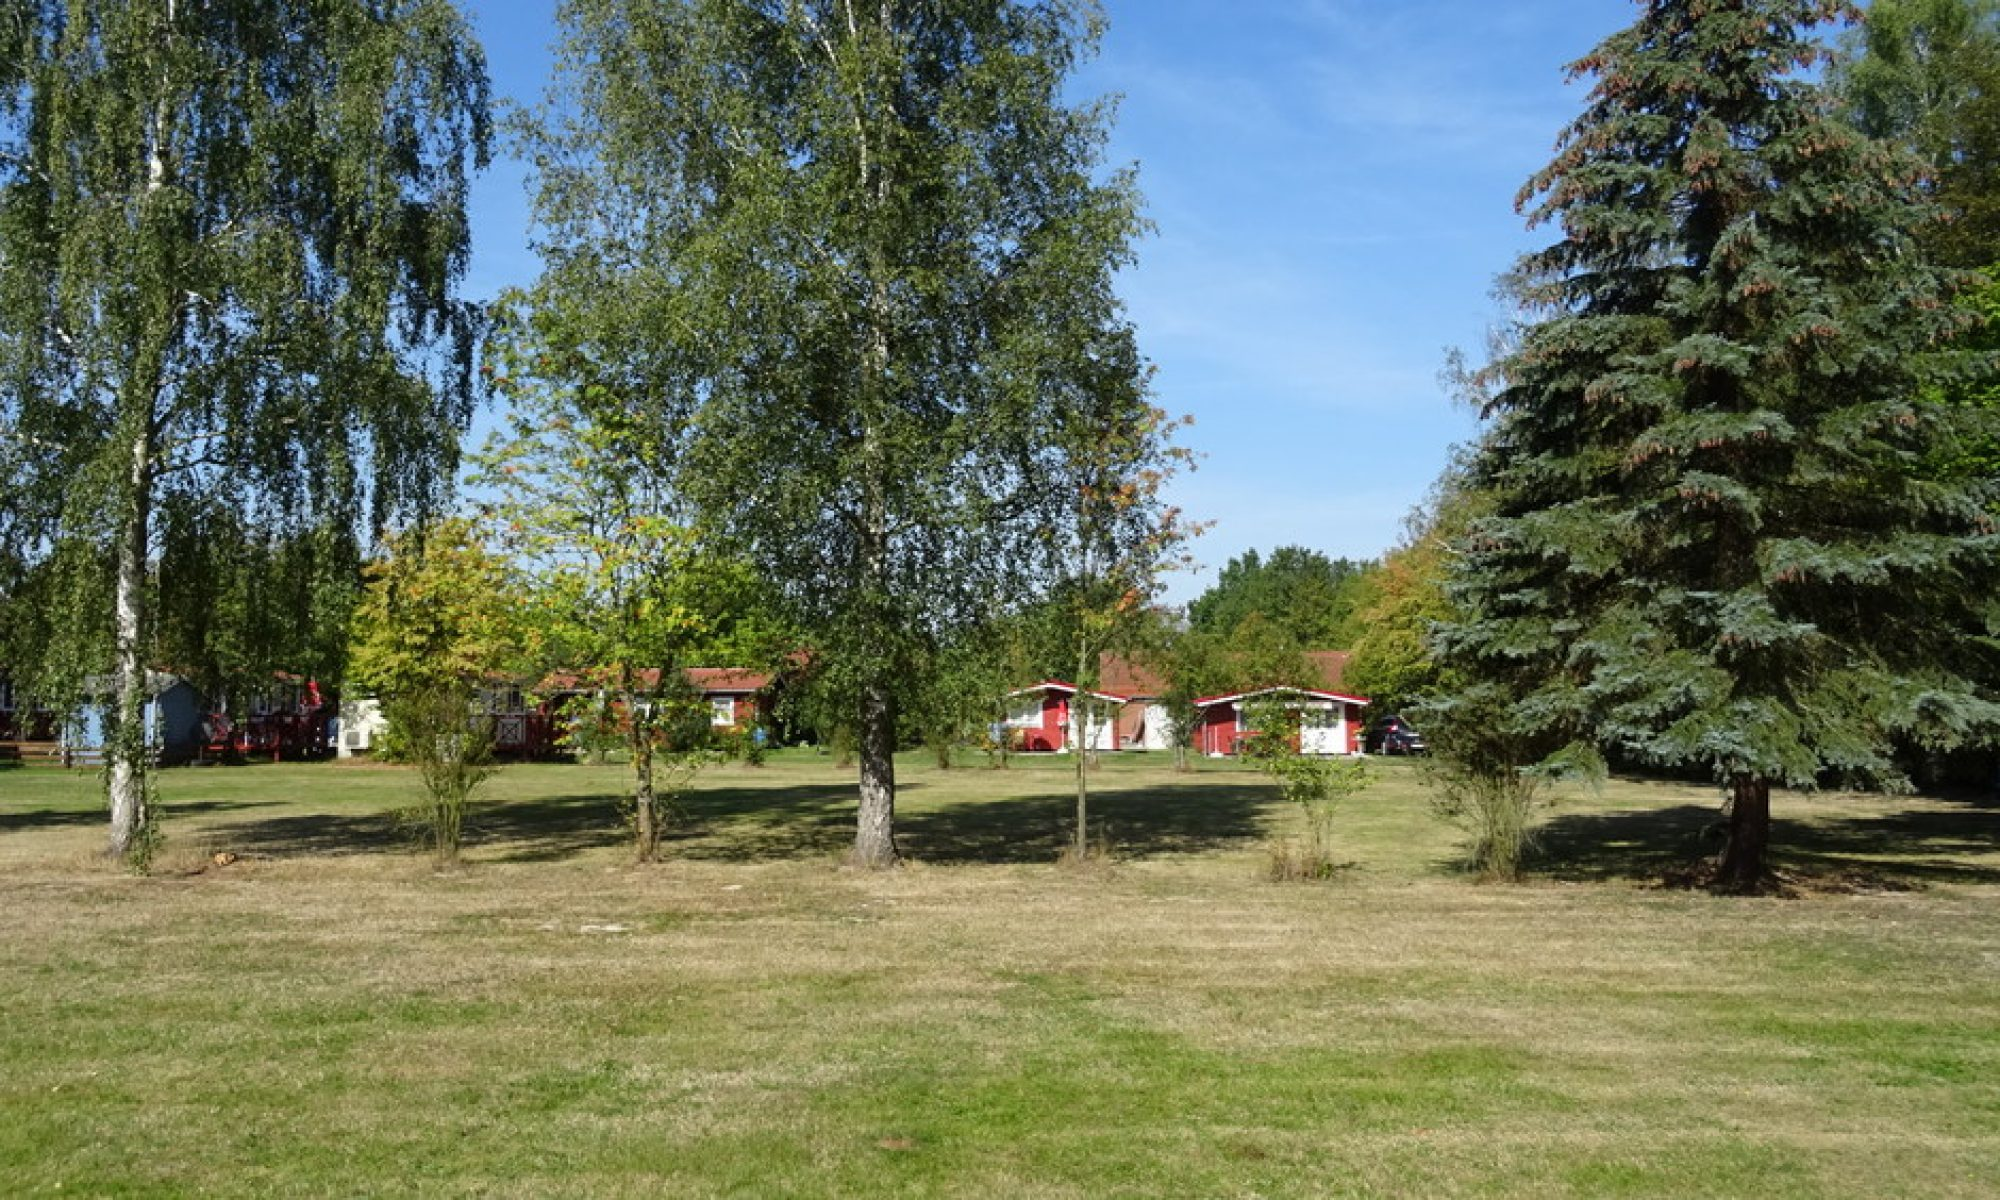 Campingpark Fuhrenkamp